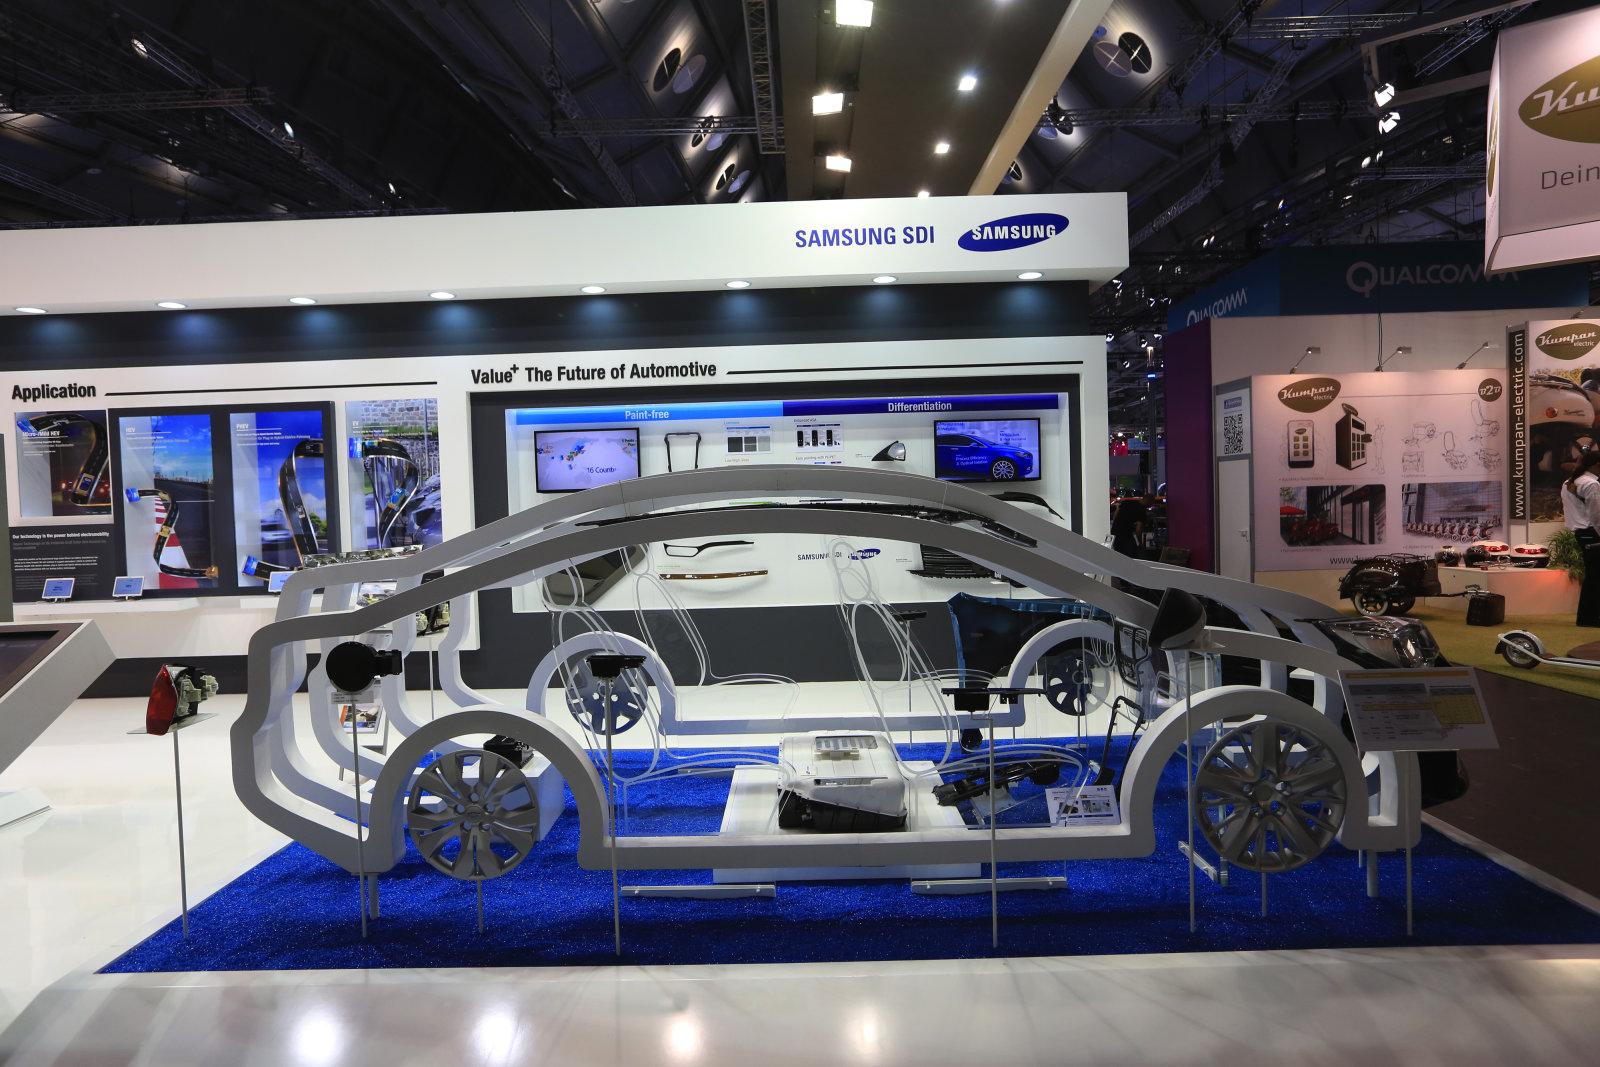 Samsung-SDI-booth-EV-battery